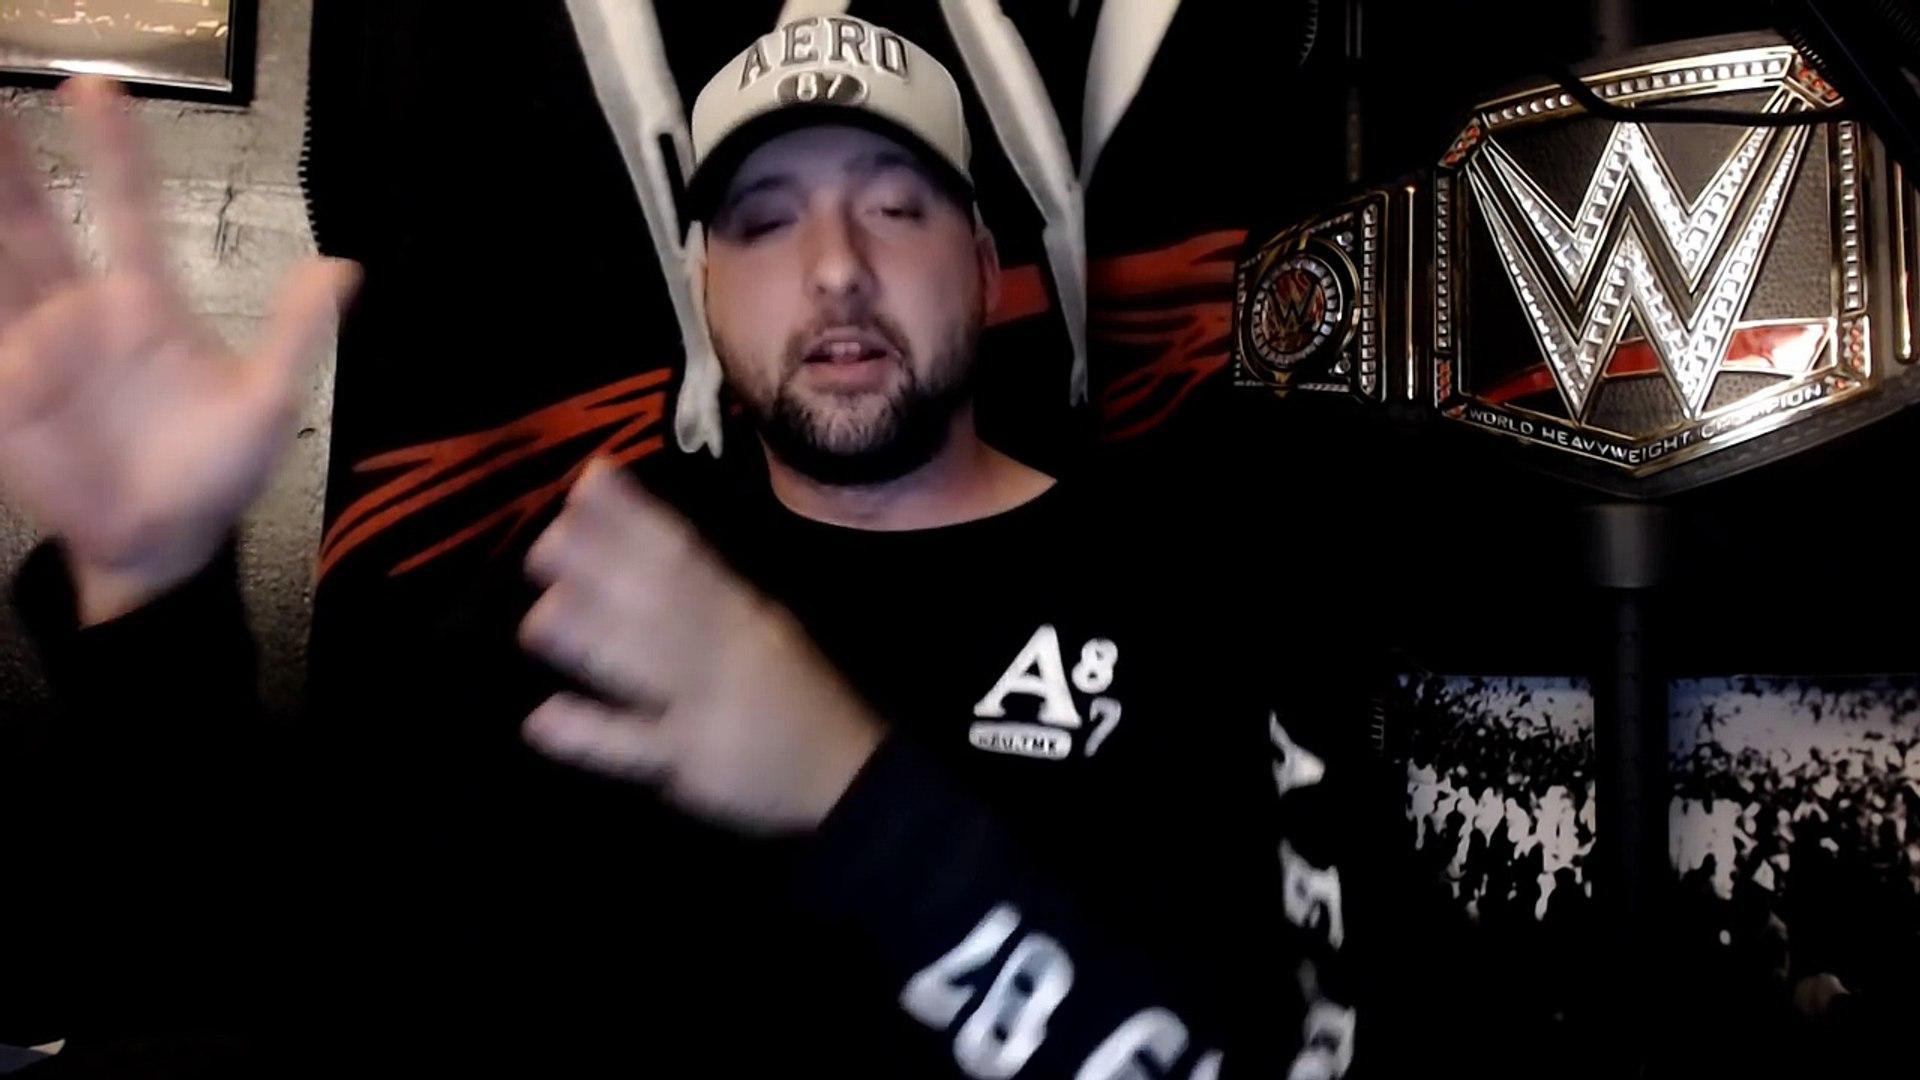 WWE Sin Cara KNOCKS OUT Chris Jericho In REAL FIGHT WWE Locker Room KO  - WWE VIDEO NEWS Alert